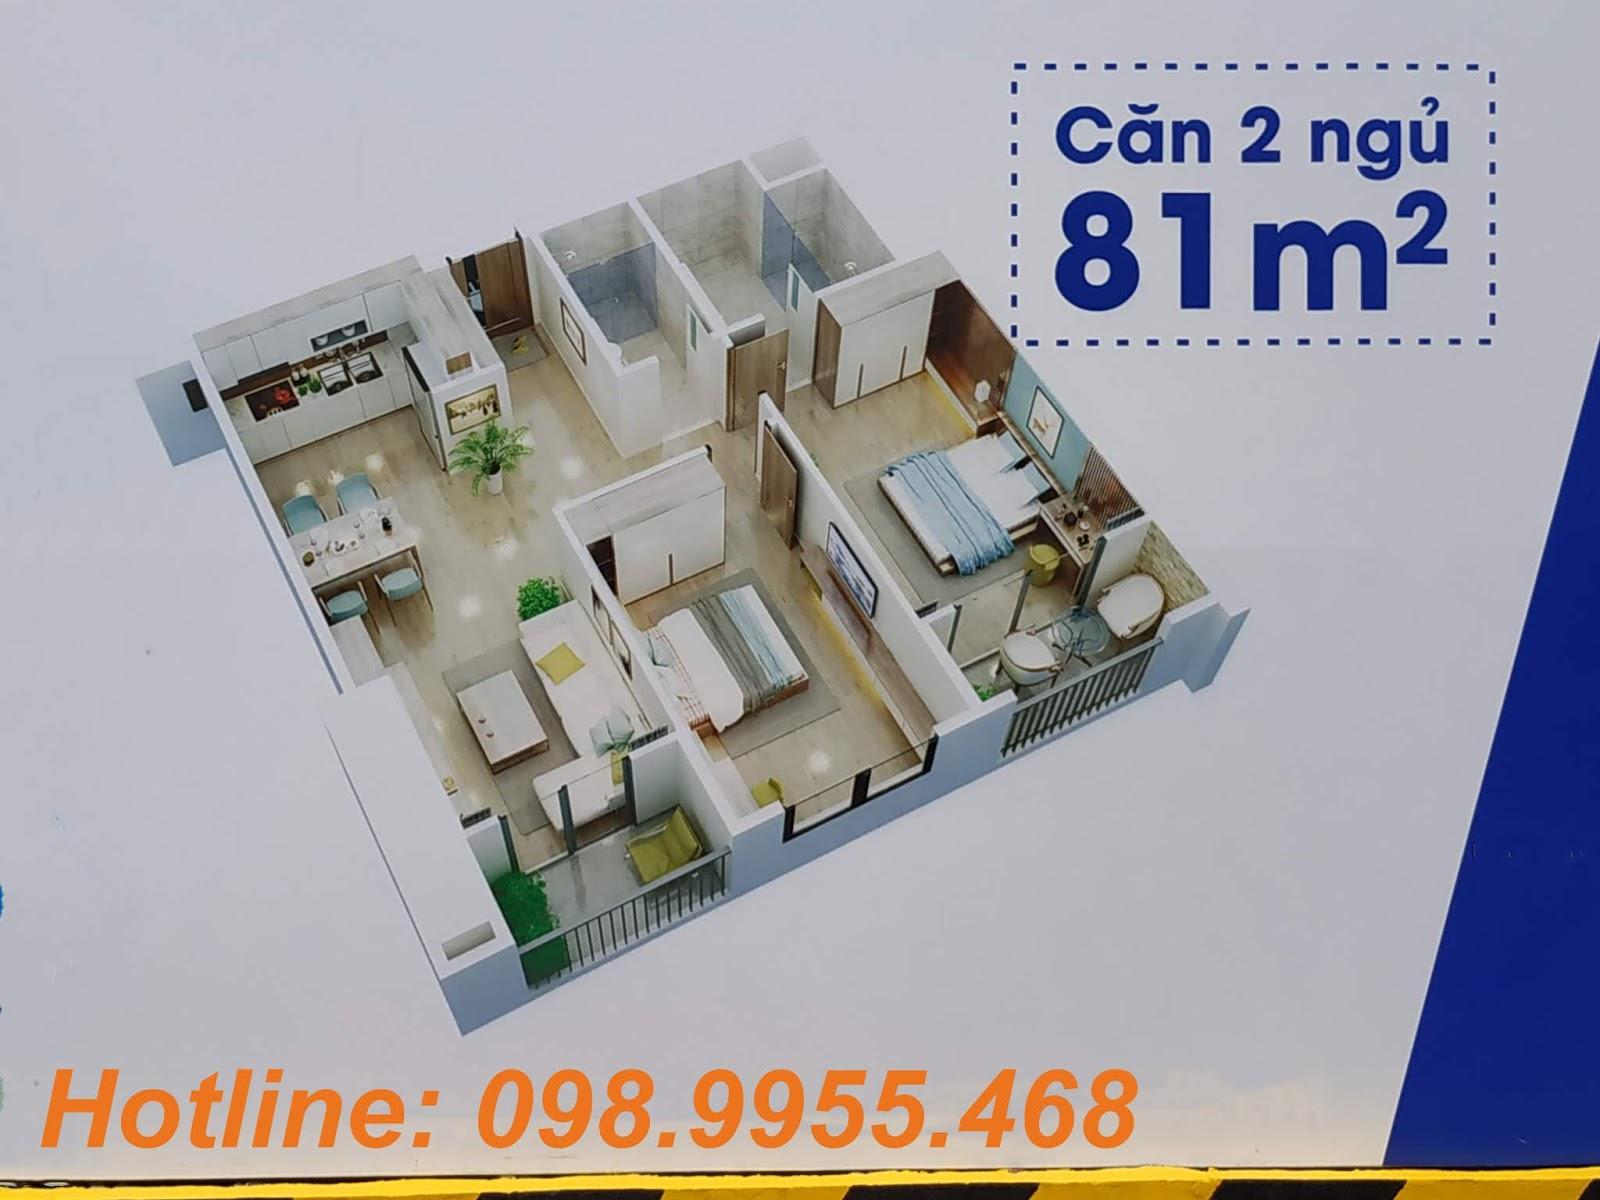 can-ho-3-phong-ngu-chung-cu-bid-residence